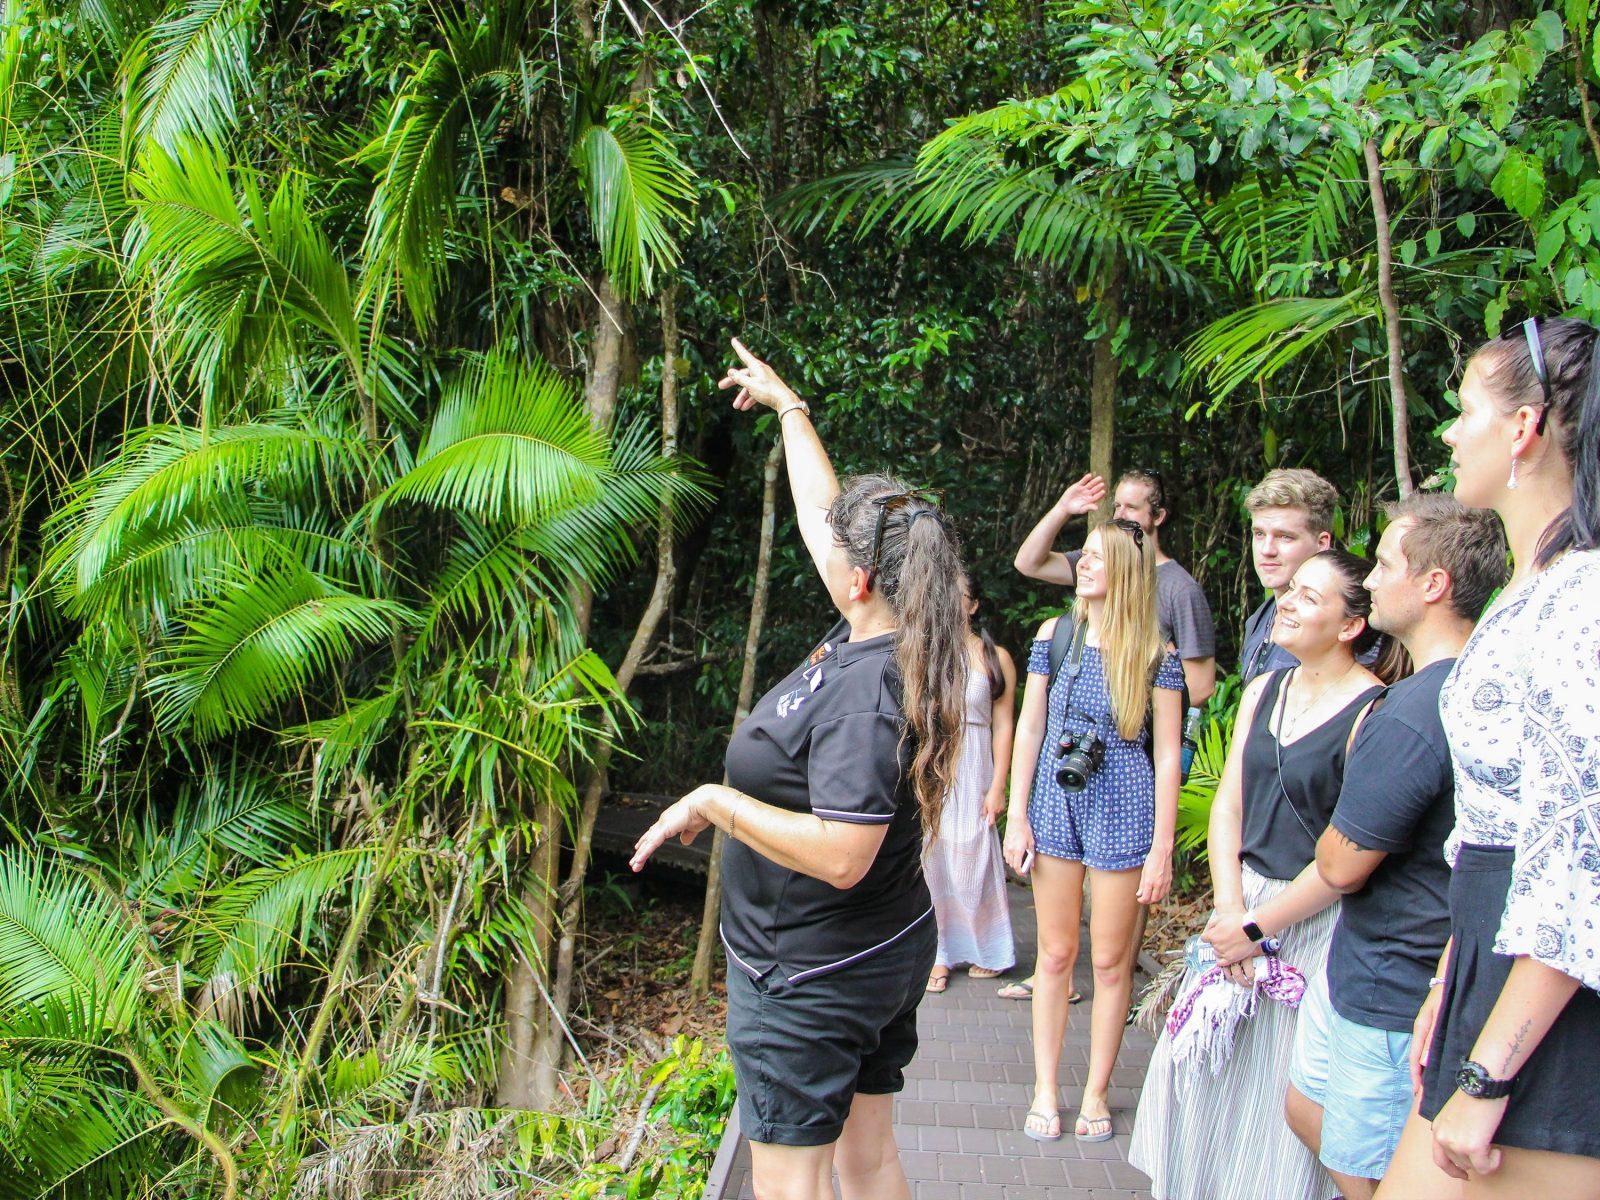 Daintree Rainforest Guided Boardwalk Tour Jungle Tours and Trekking